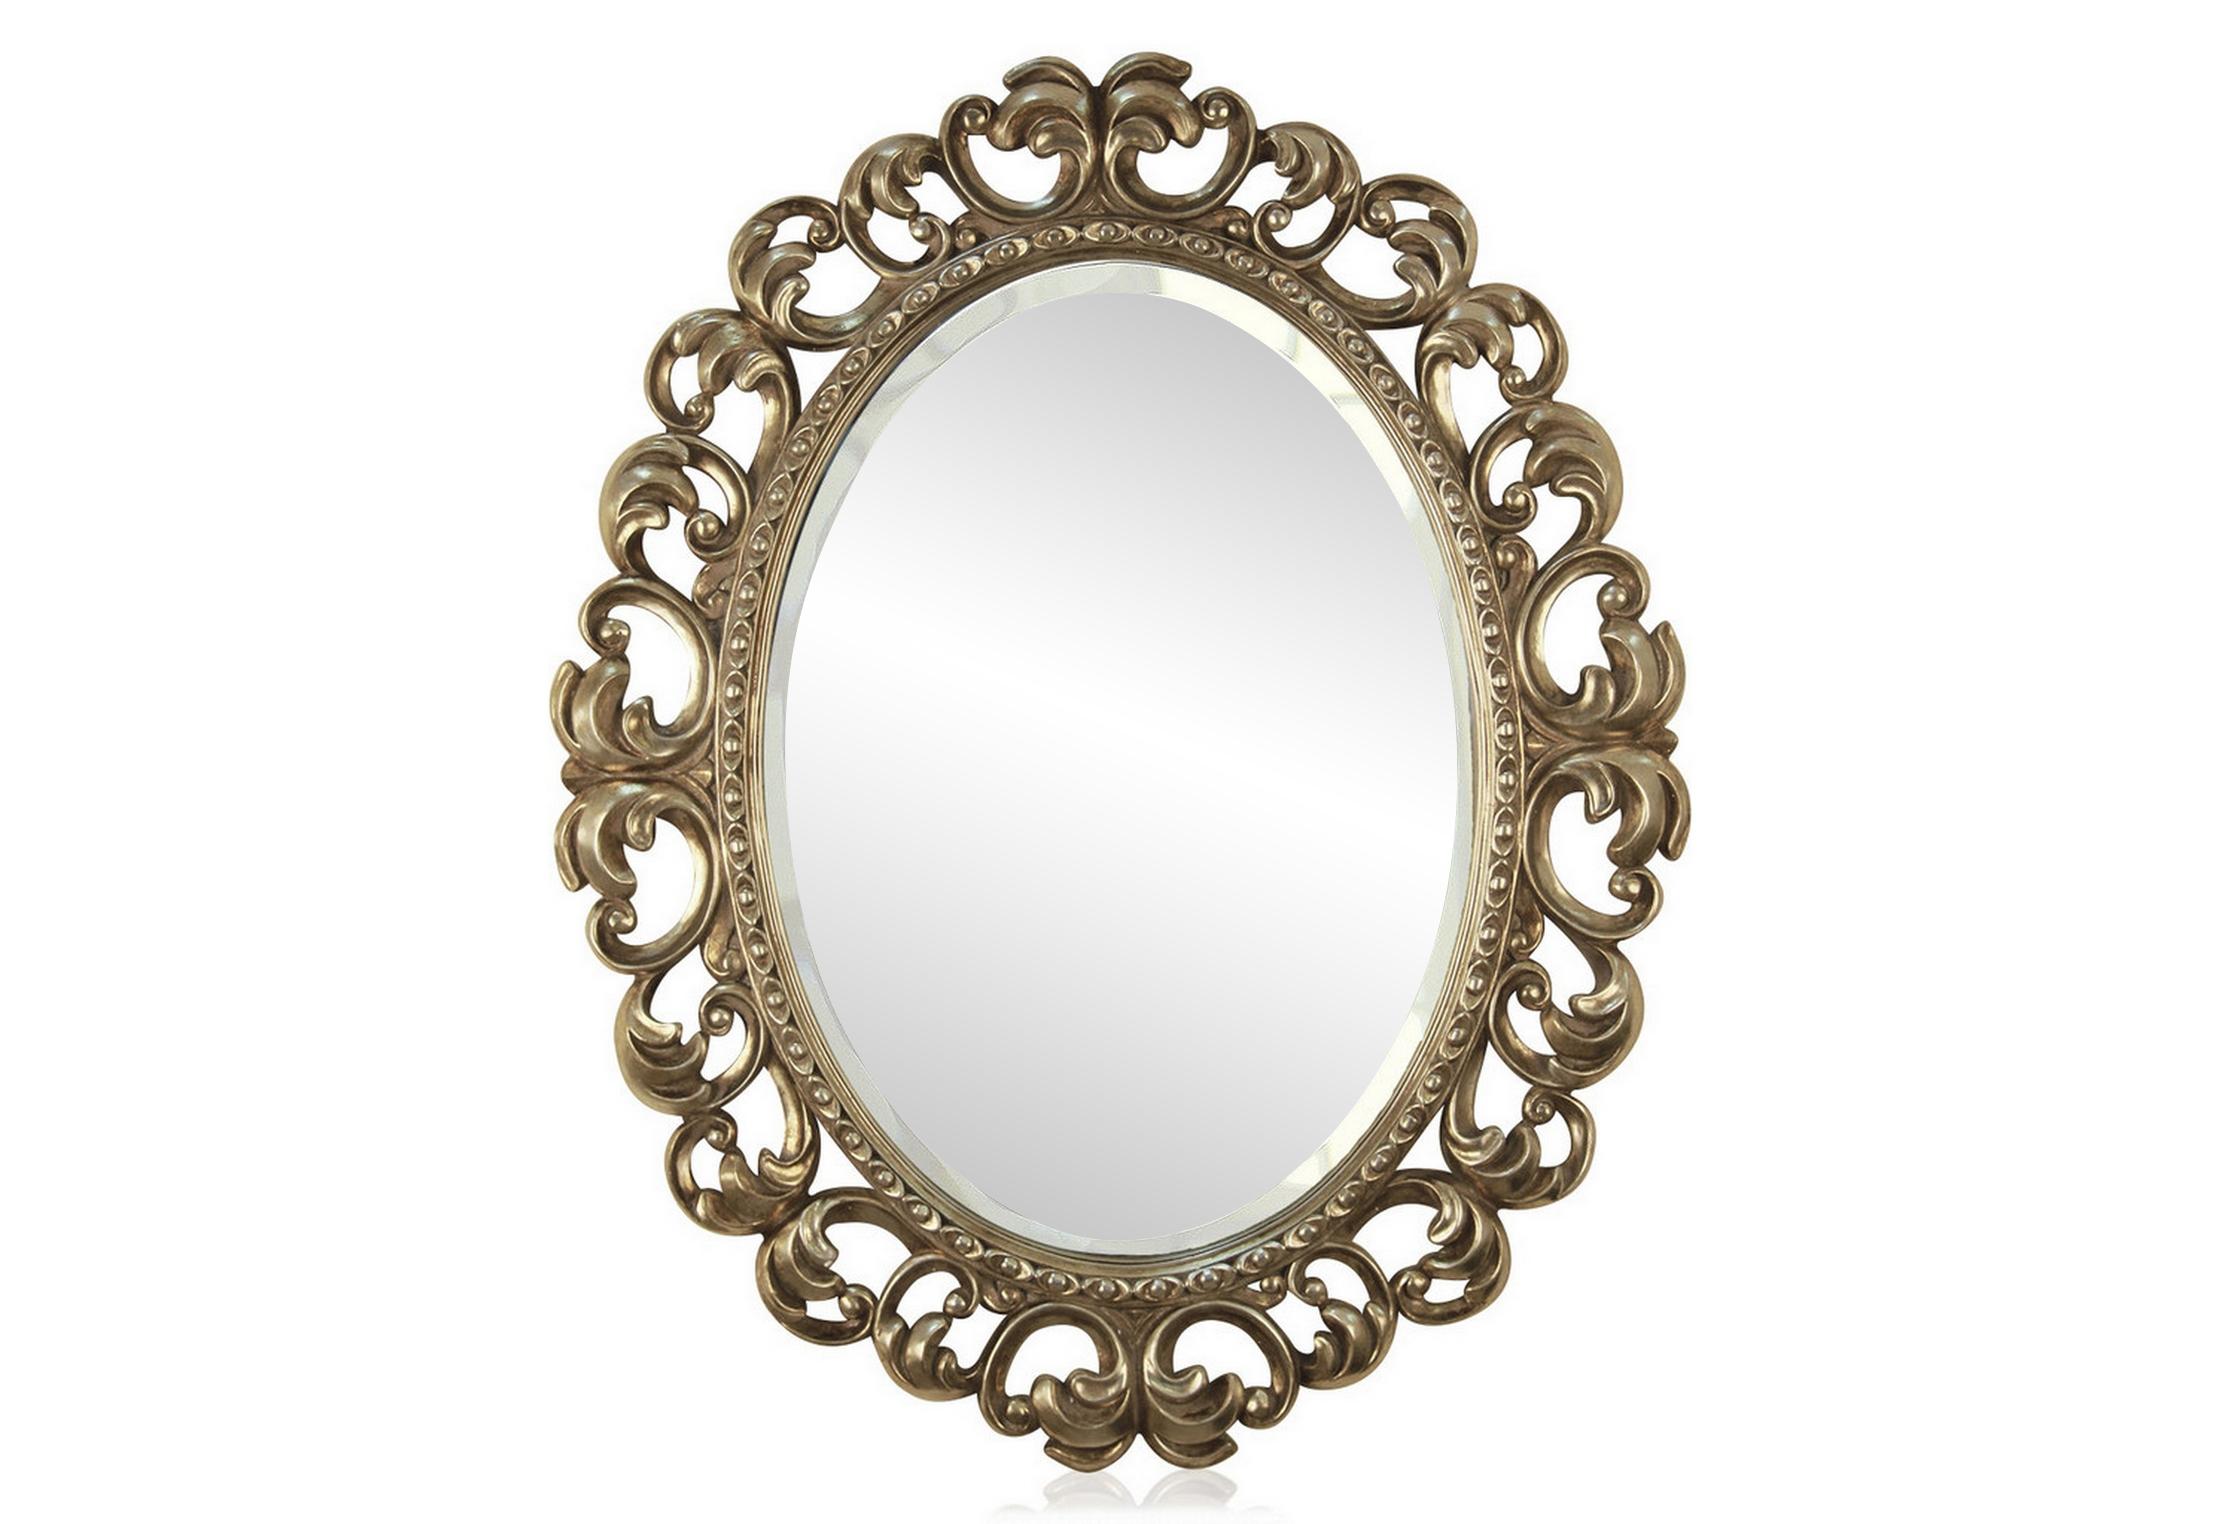 Зеркало ШербурНастенные зеркала<br>Материал: дерево, полиуретан.<br><br>Material: Пластик<br>Ширина см: 80<br>Высота см: 100<br>Глубина см: 4